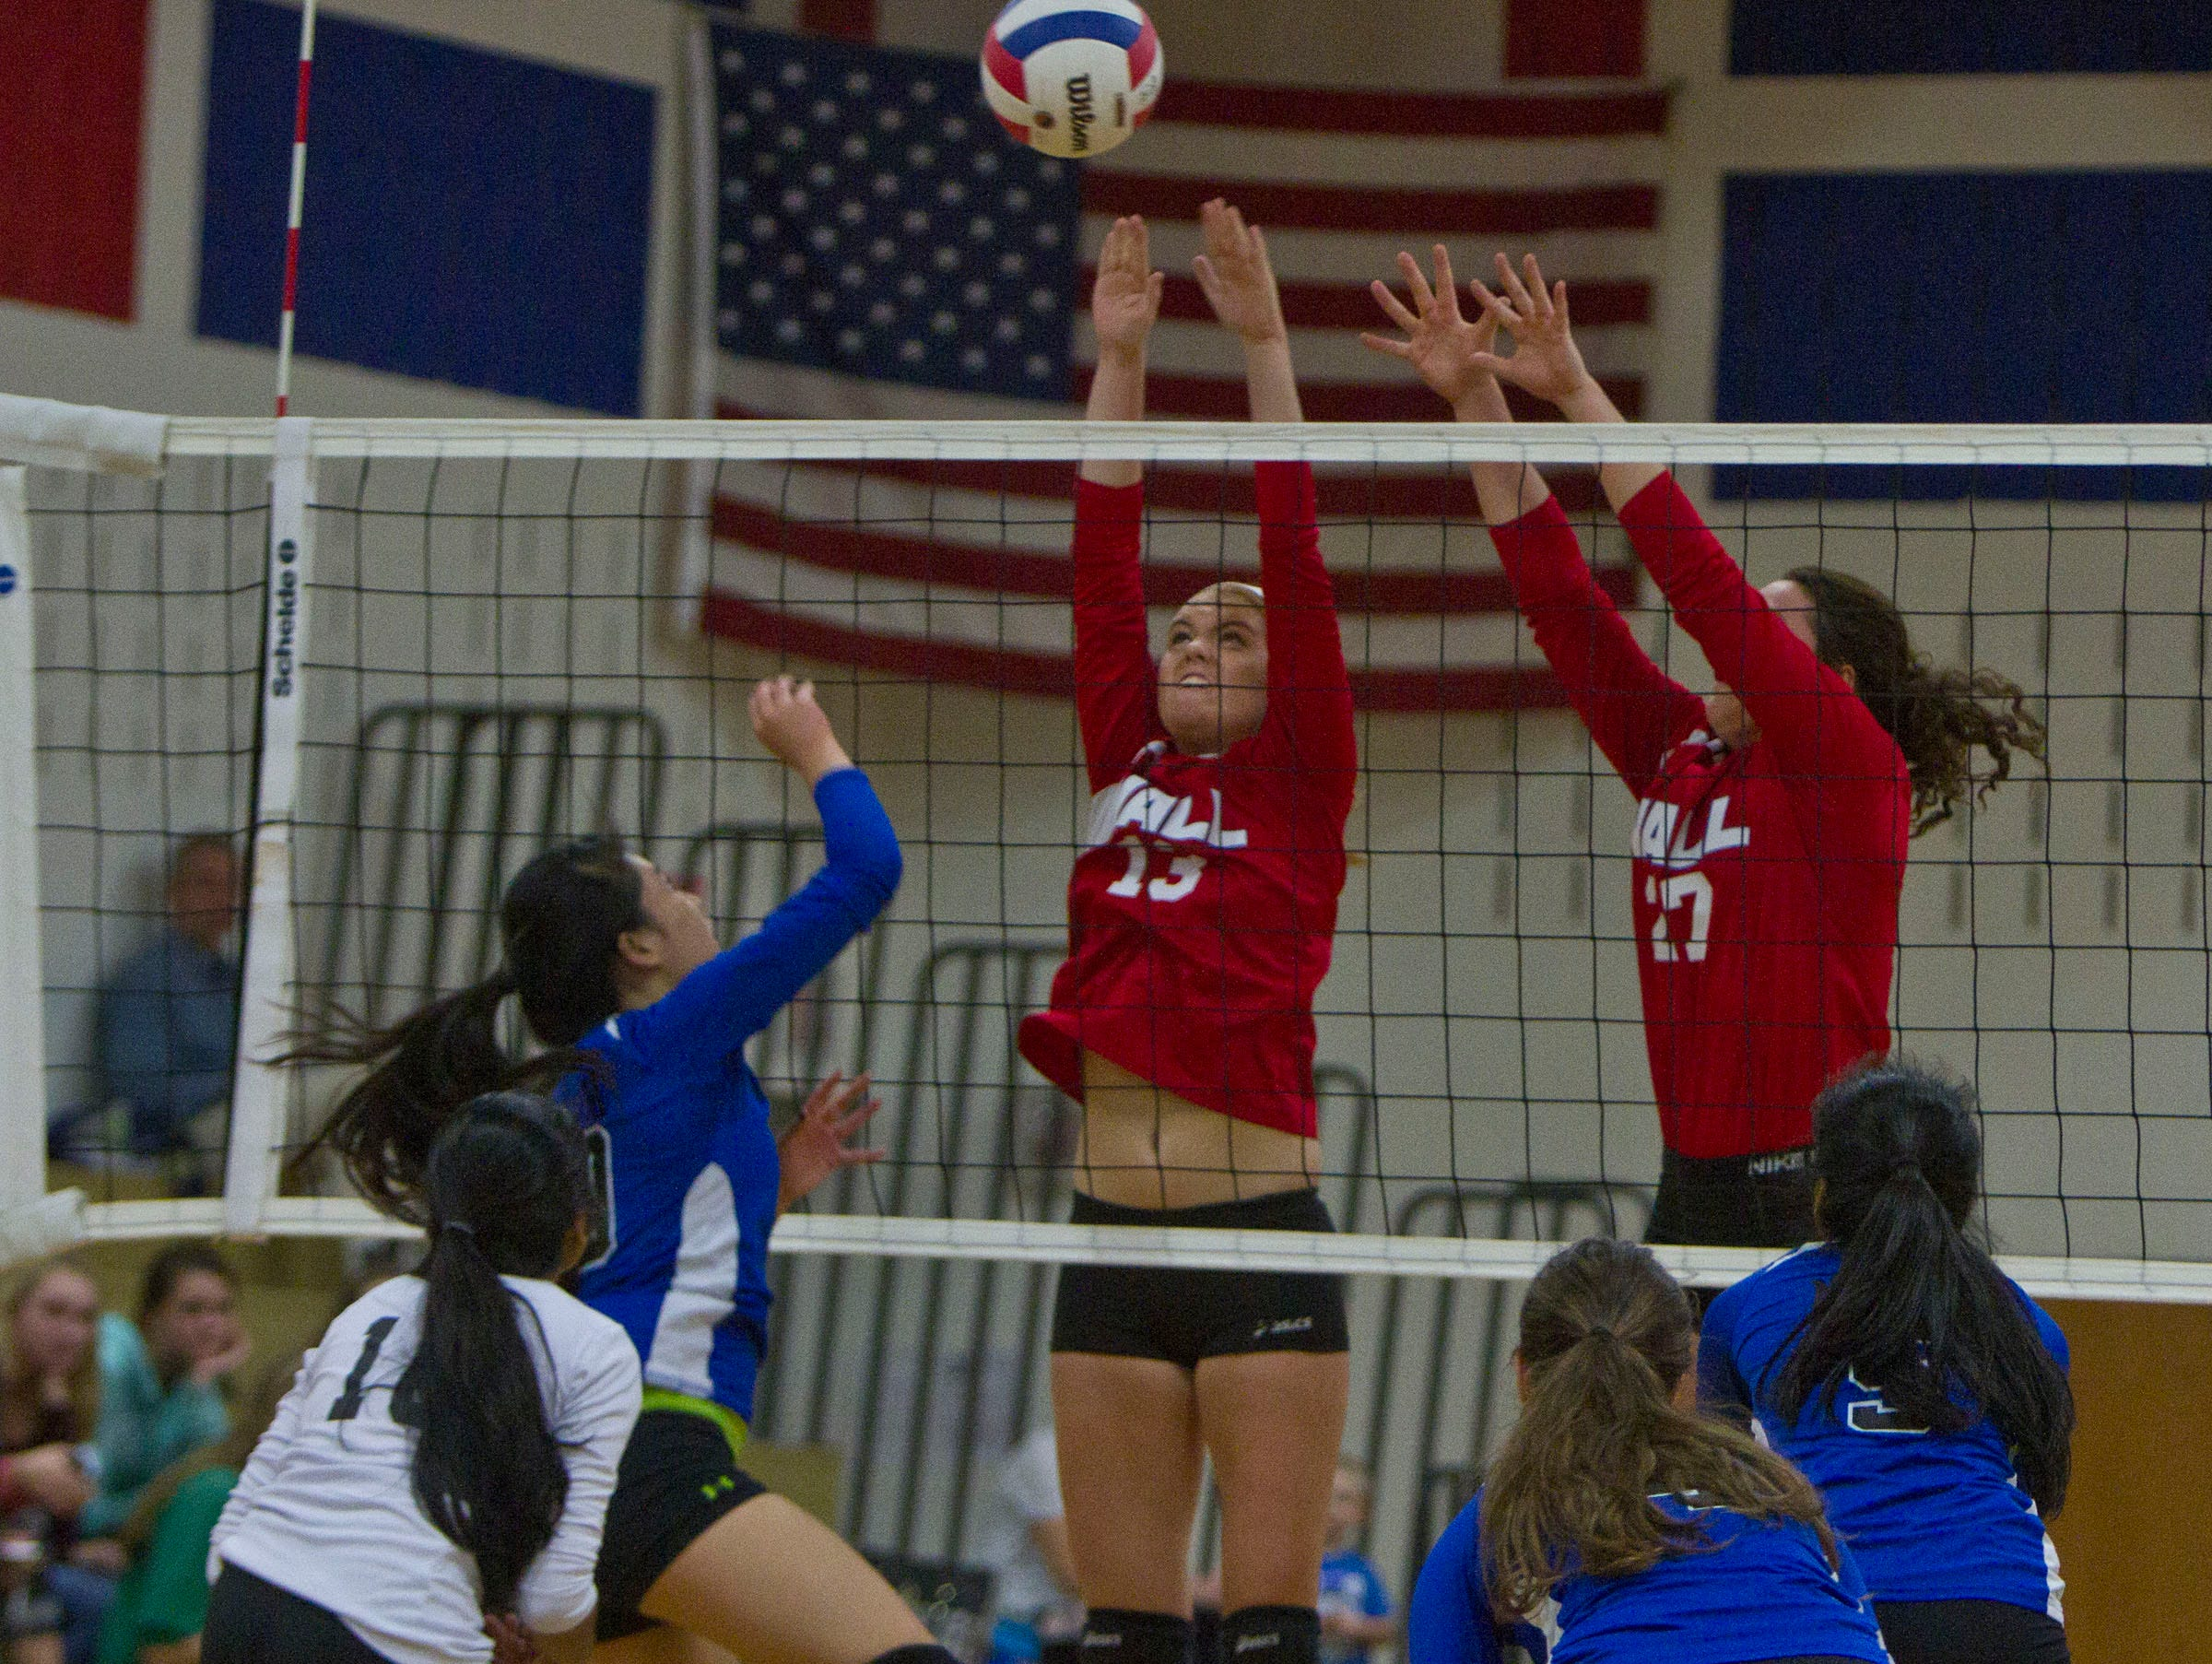 Wall's Regan Murphy (13) and Colleen Brennan block a shot. NJSIAA volleyball match between Wall and West Windsor Plainsboro North. Wall Township, NJ Wednesday, November 4, 2015 @dhoodhood